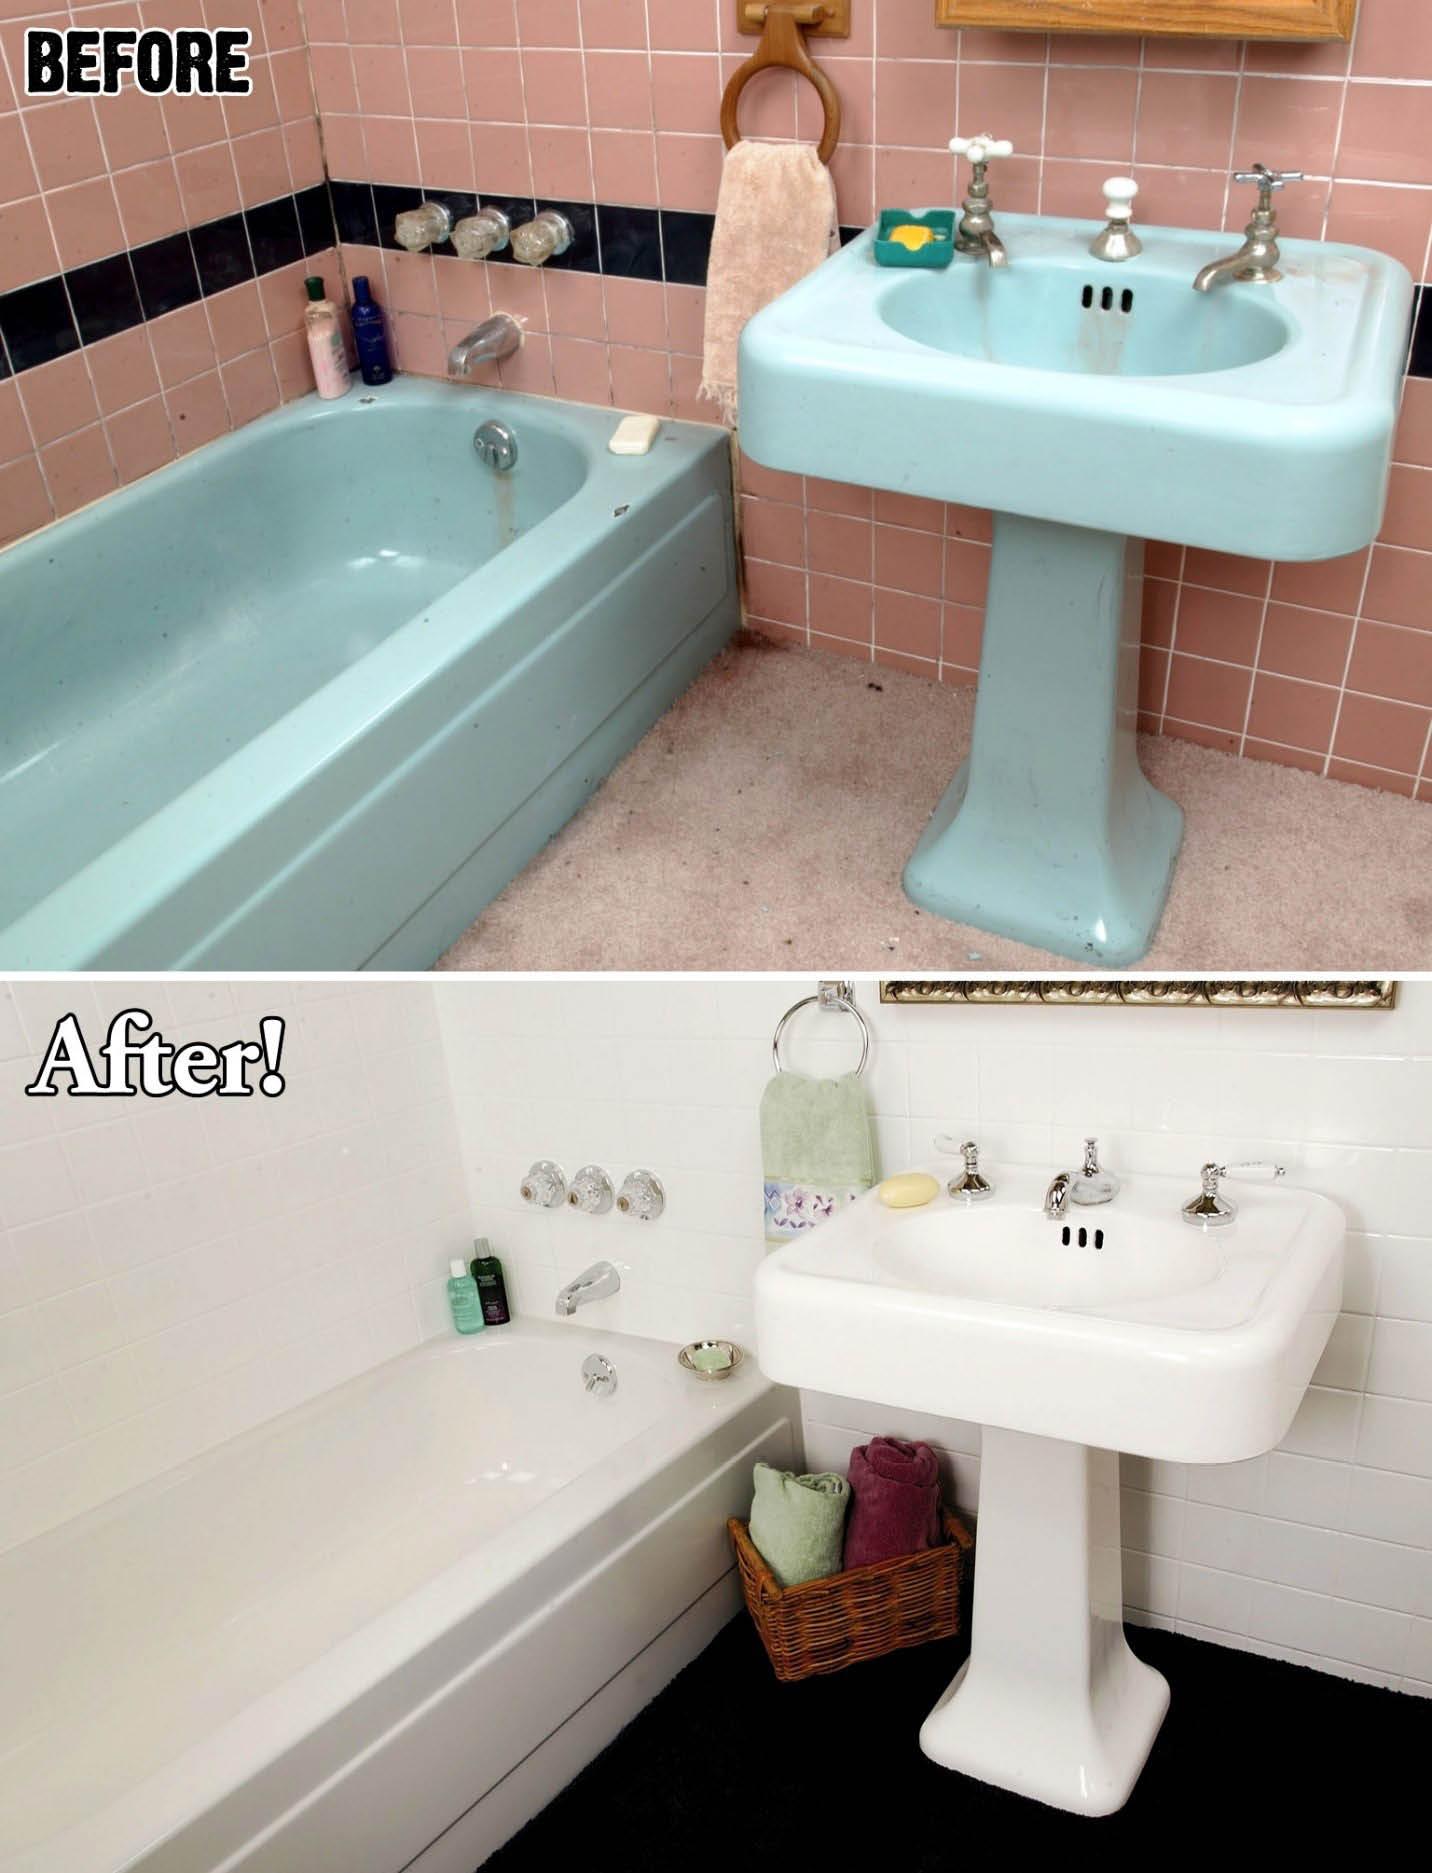 Counter Resurfacing - Tile Refinishing - GA Home Improvement Coupons